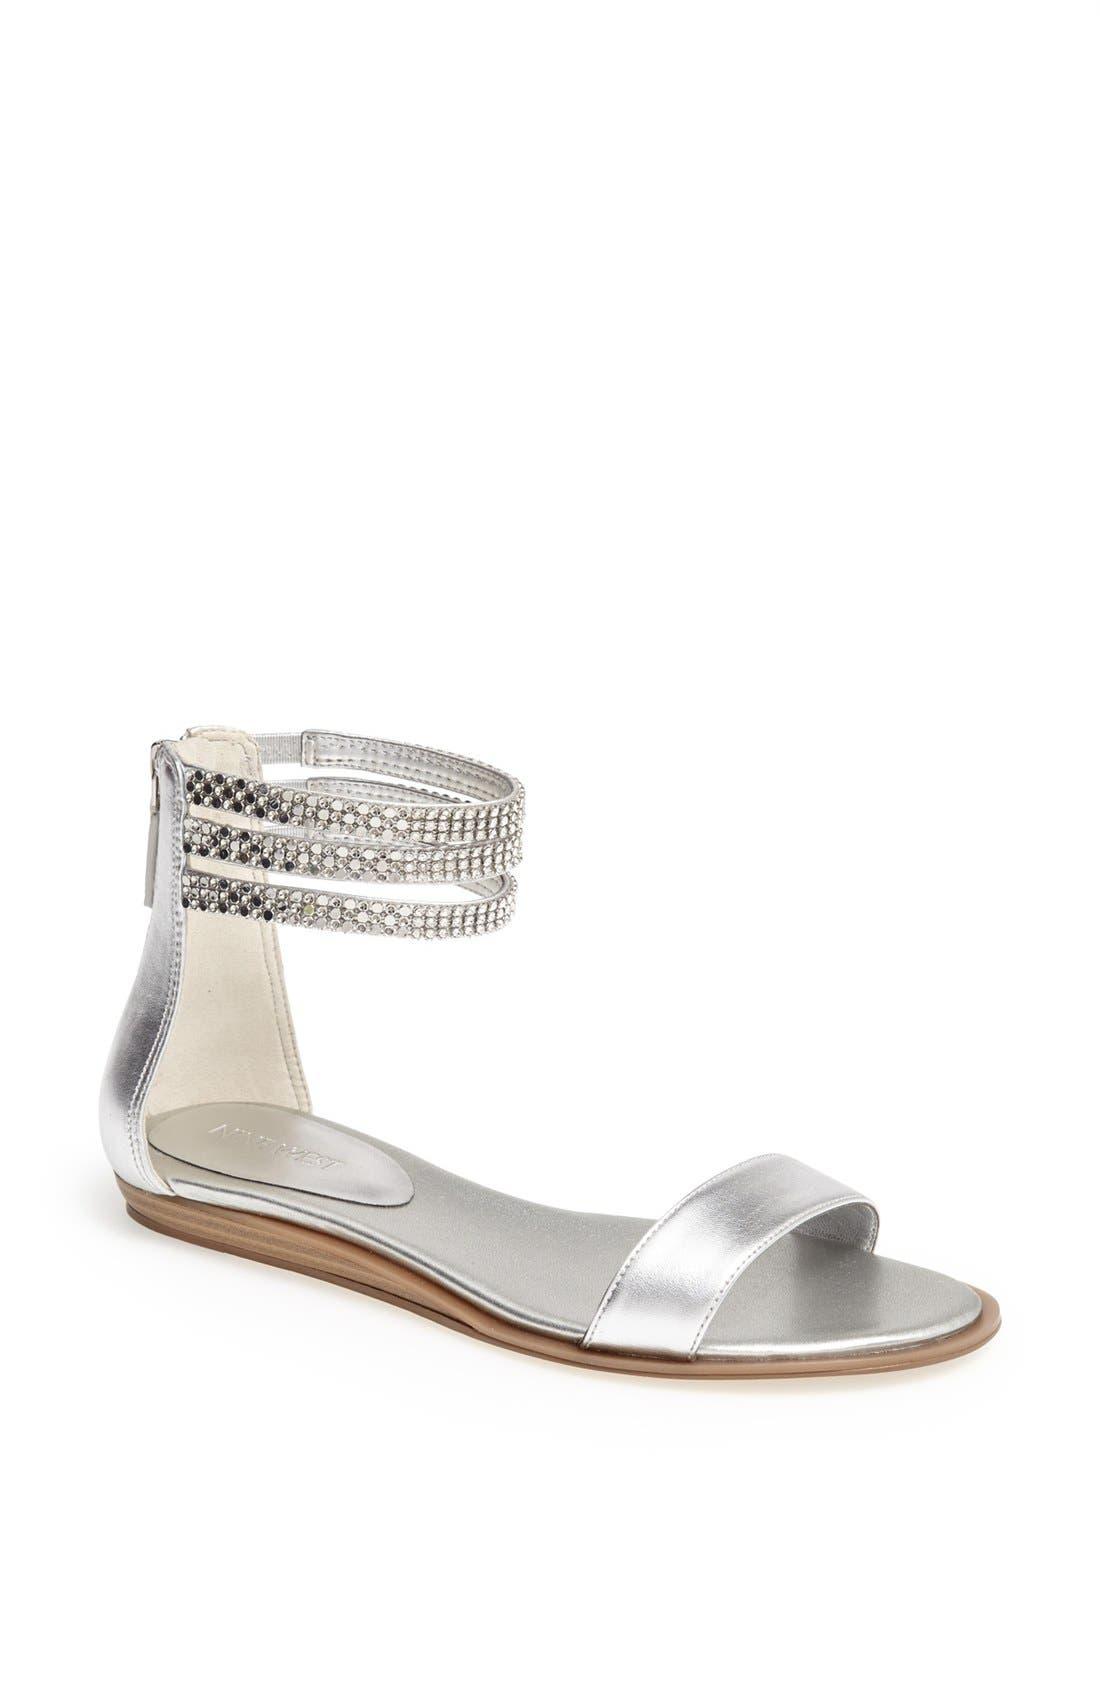 Alternate Image 1 Selected - Nine West 'Viemette' Sandal